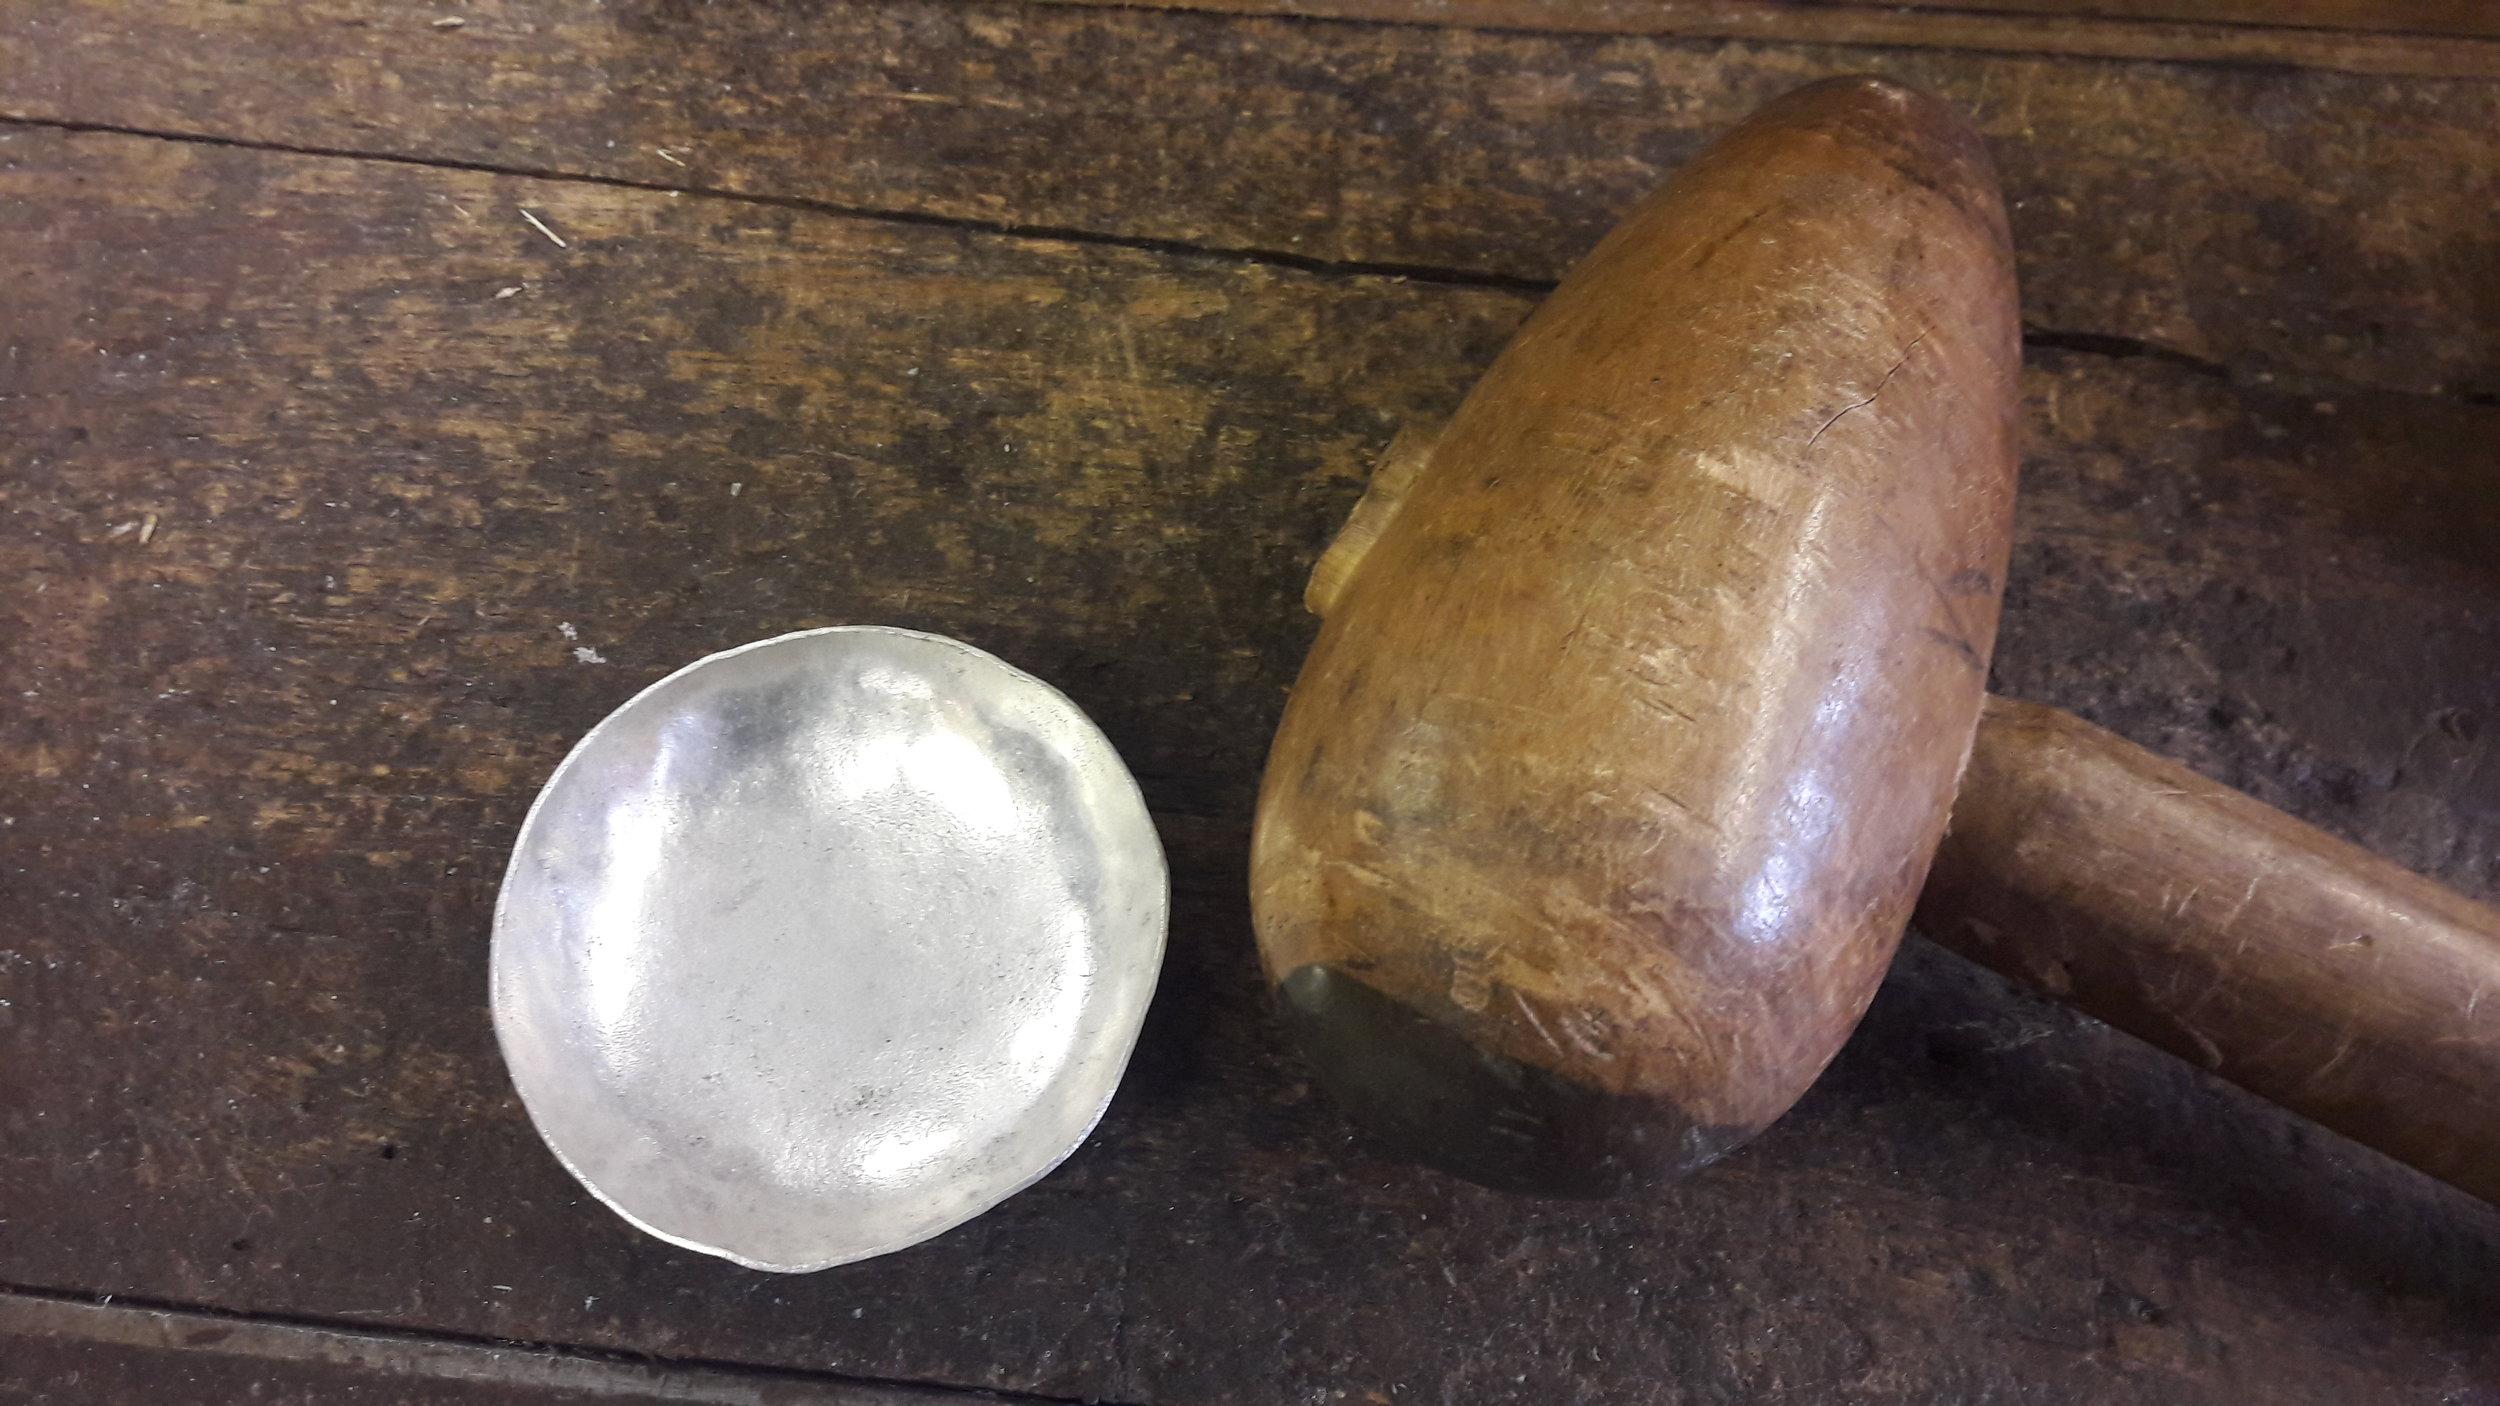 Doesn't quite look like en egg cup yet....